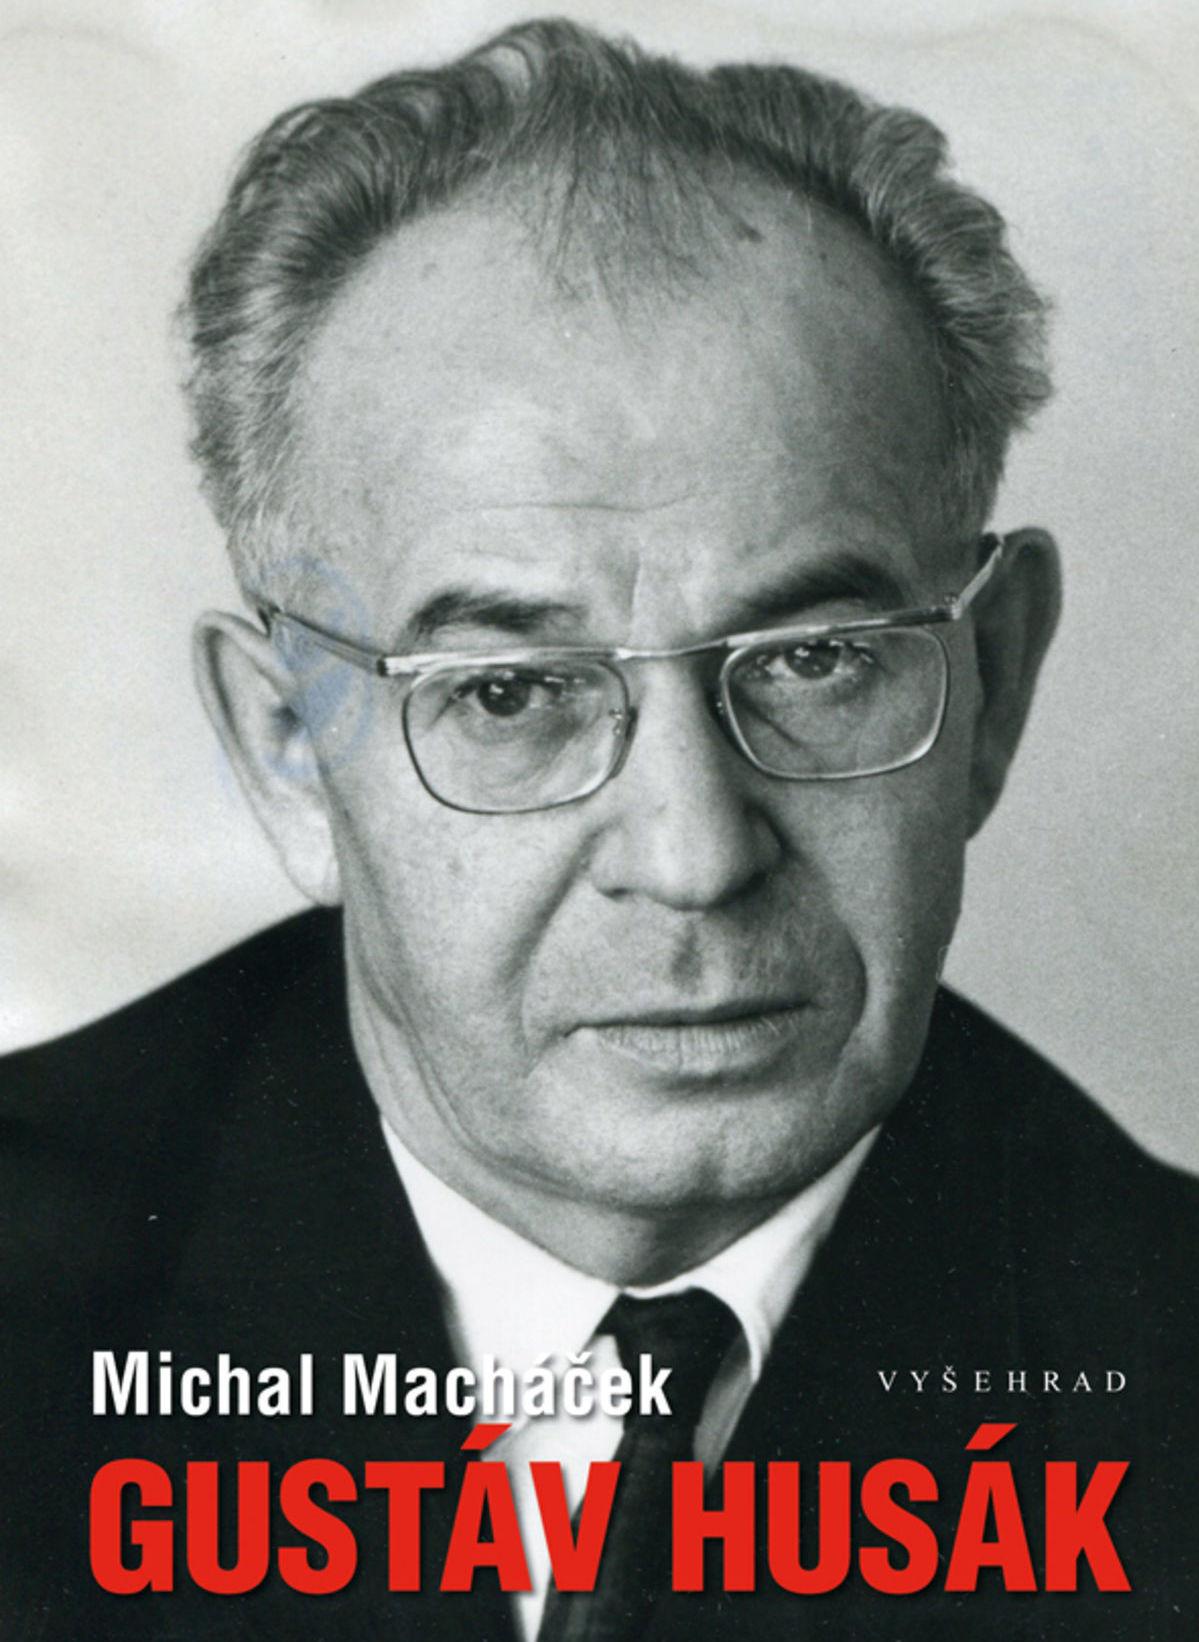 Obálka knihy Michala Macháčka.